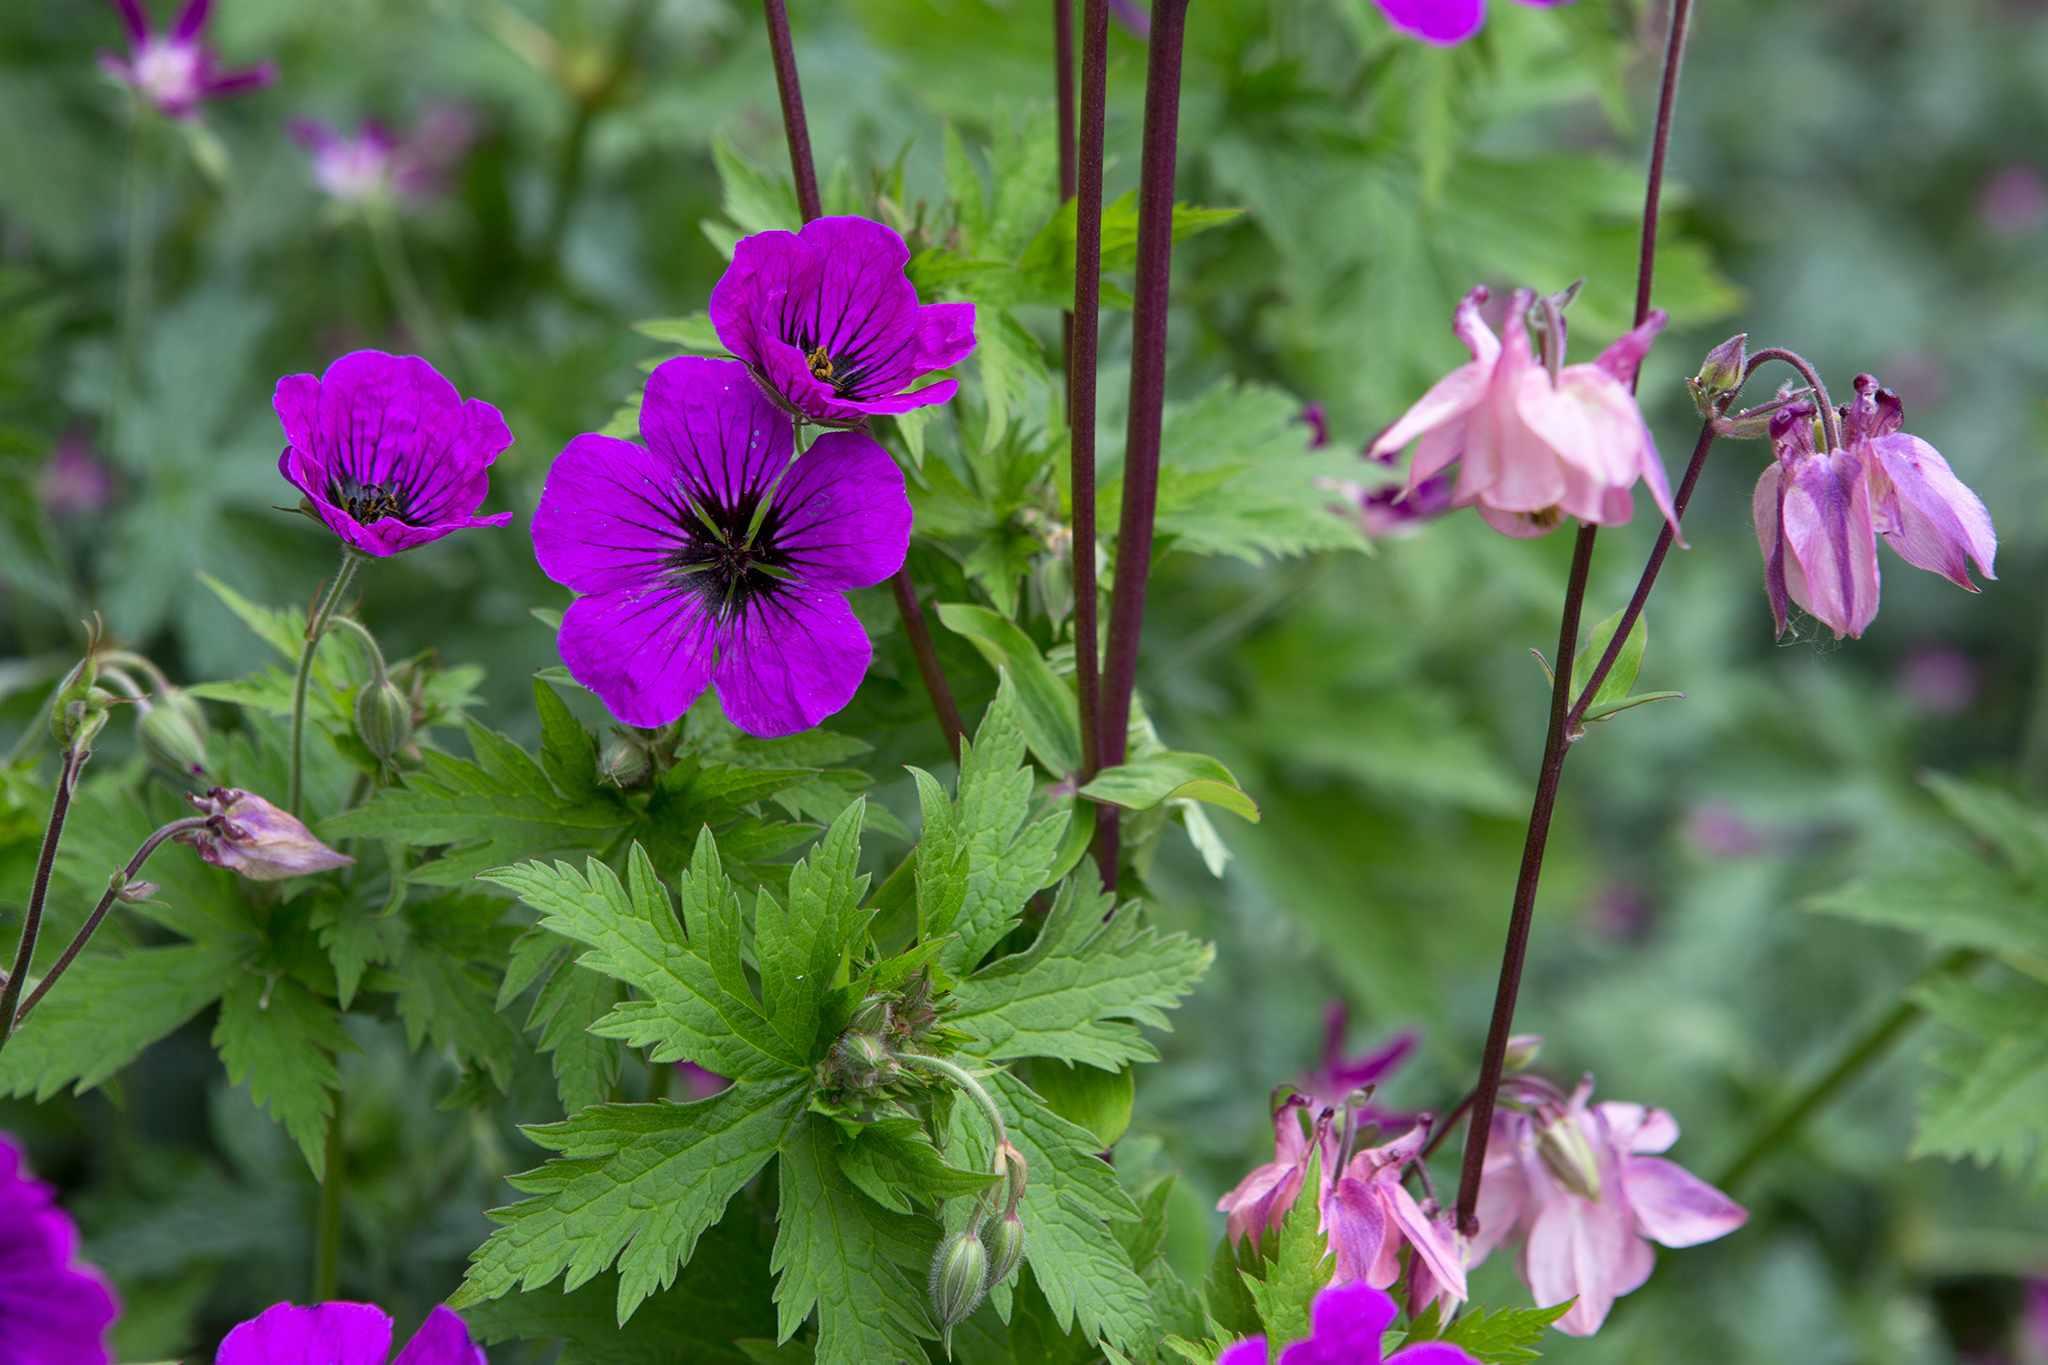 Purple geranium flowers